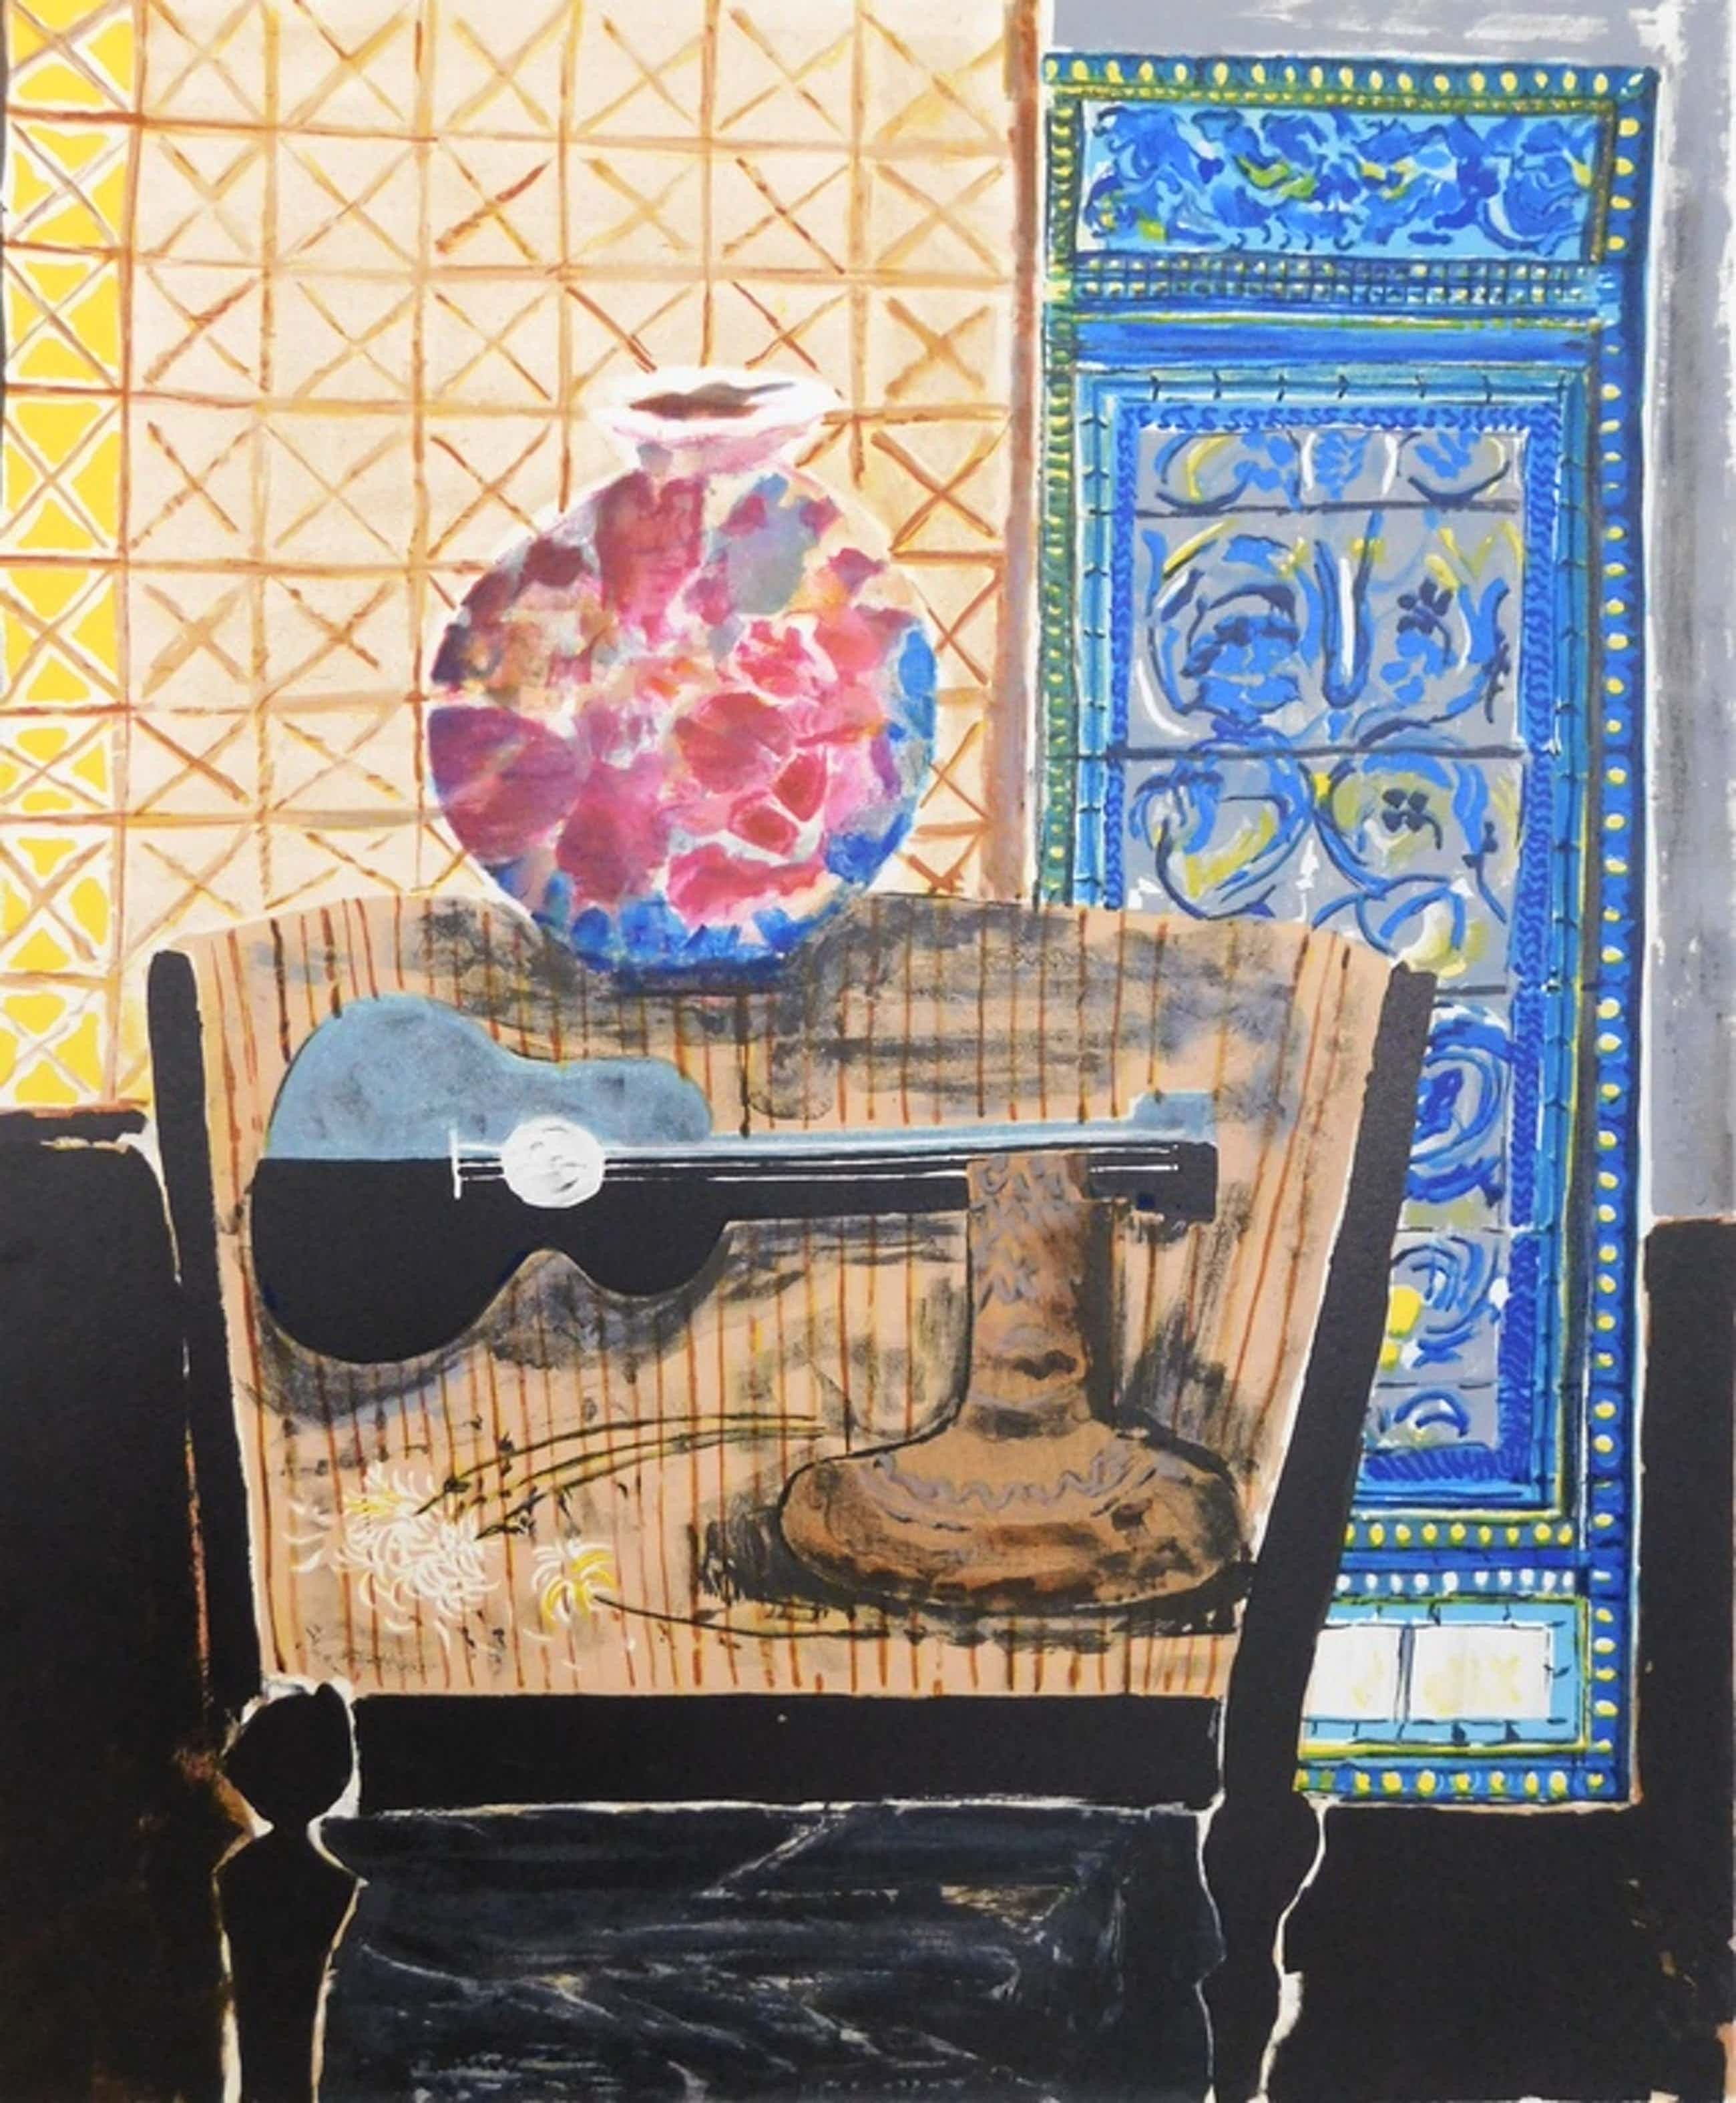 Wndy Chazin - kleurenlitho - Composition with Guitar and Vase kopen? Bied vanaf 40!